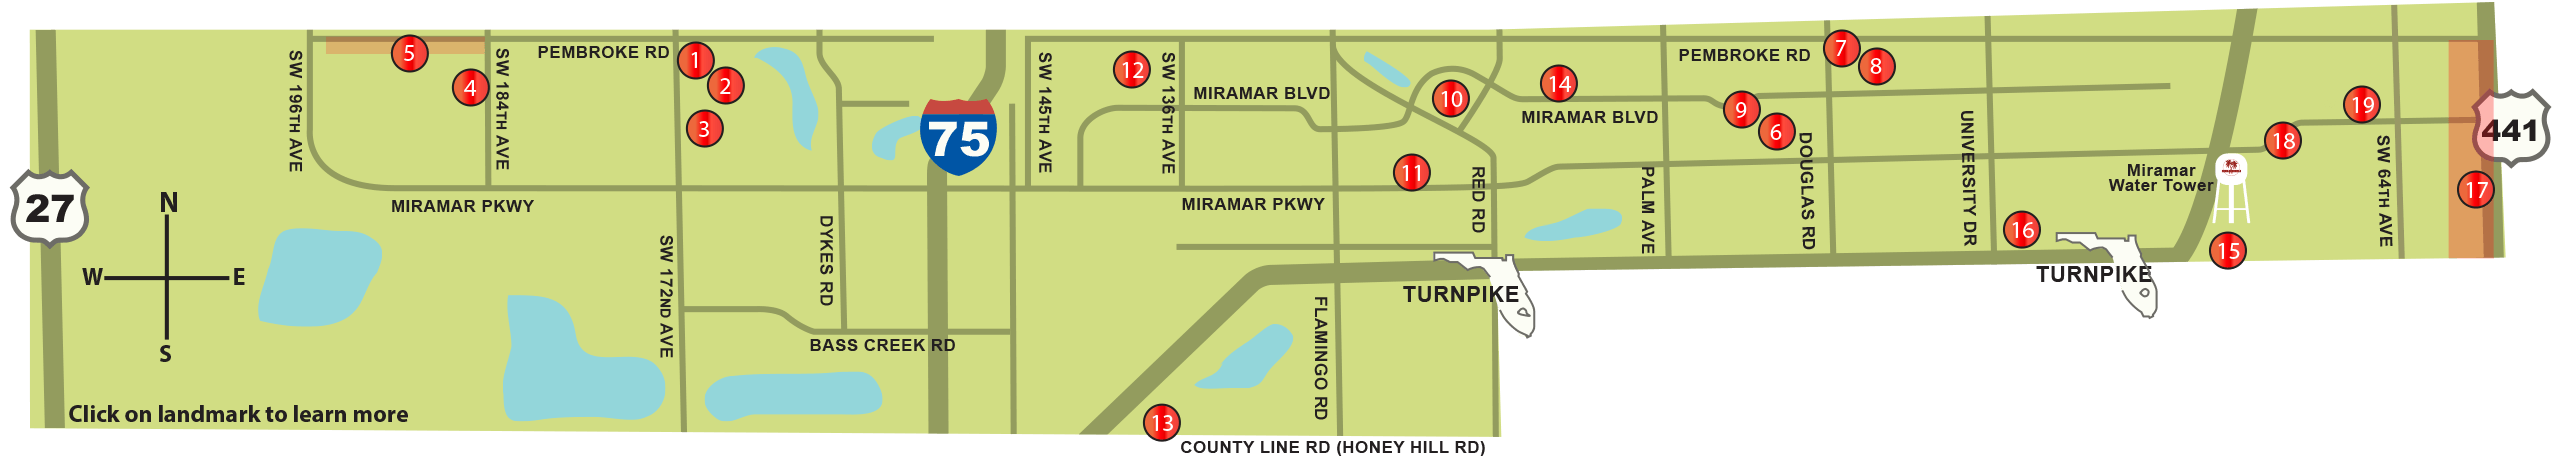 Revenue Bond 2013 Projects Map Miramar Fl Official Website